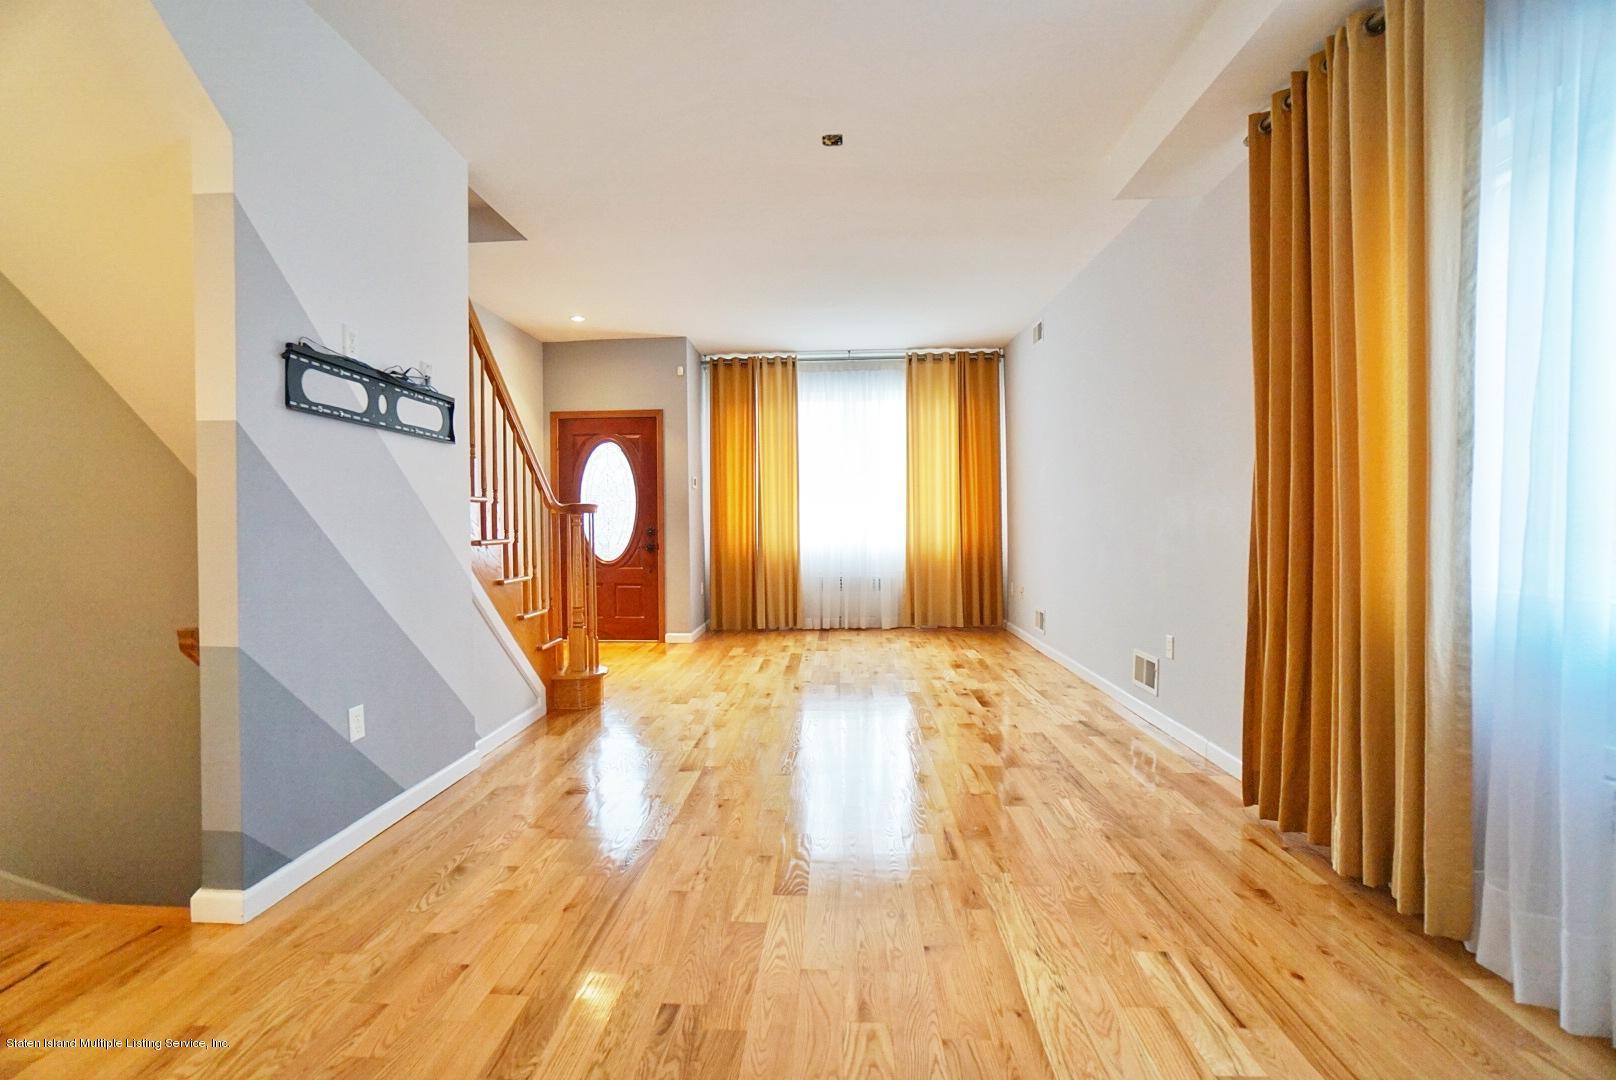 Single Family - Detached 311 Norway Avenue  Staten Island, NY 10305, MLS-1132870-5